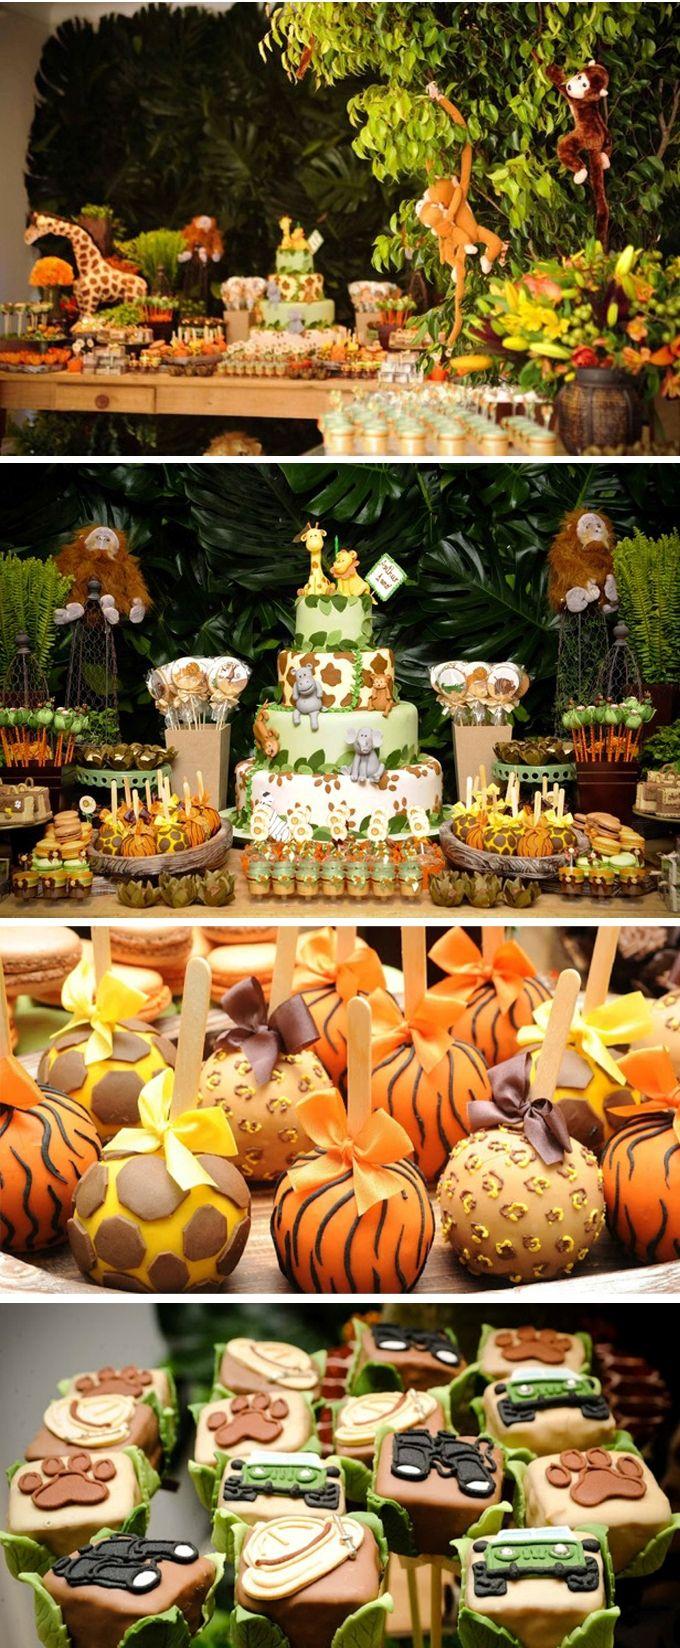 M 225 s de 1000 ideas sobre decoraciones de fiesta de safari en pinterest - Festa Safari Floresta Arthur Eliana More